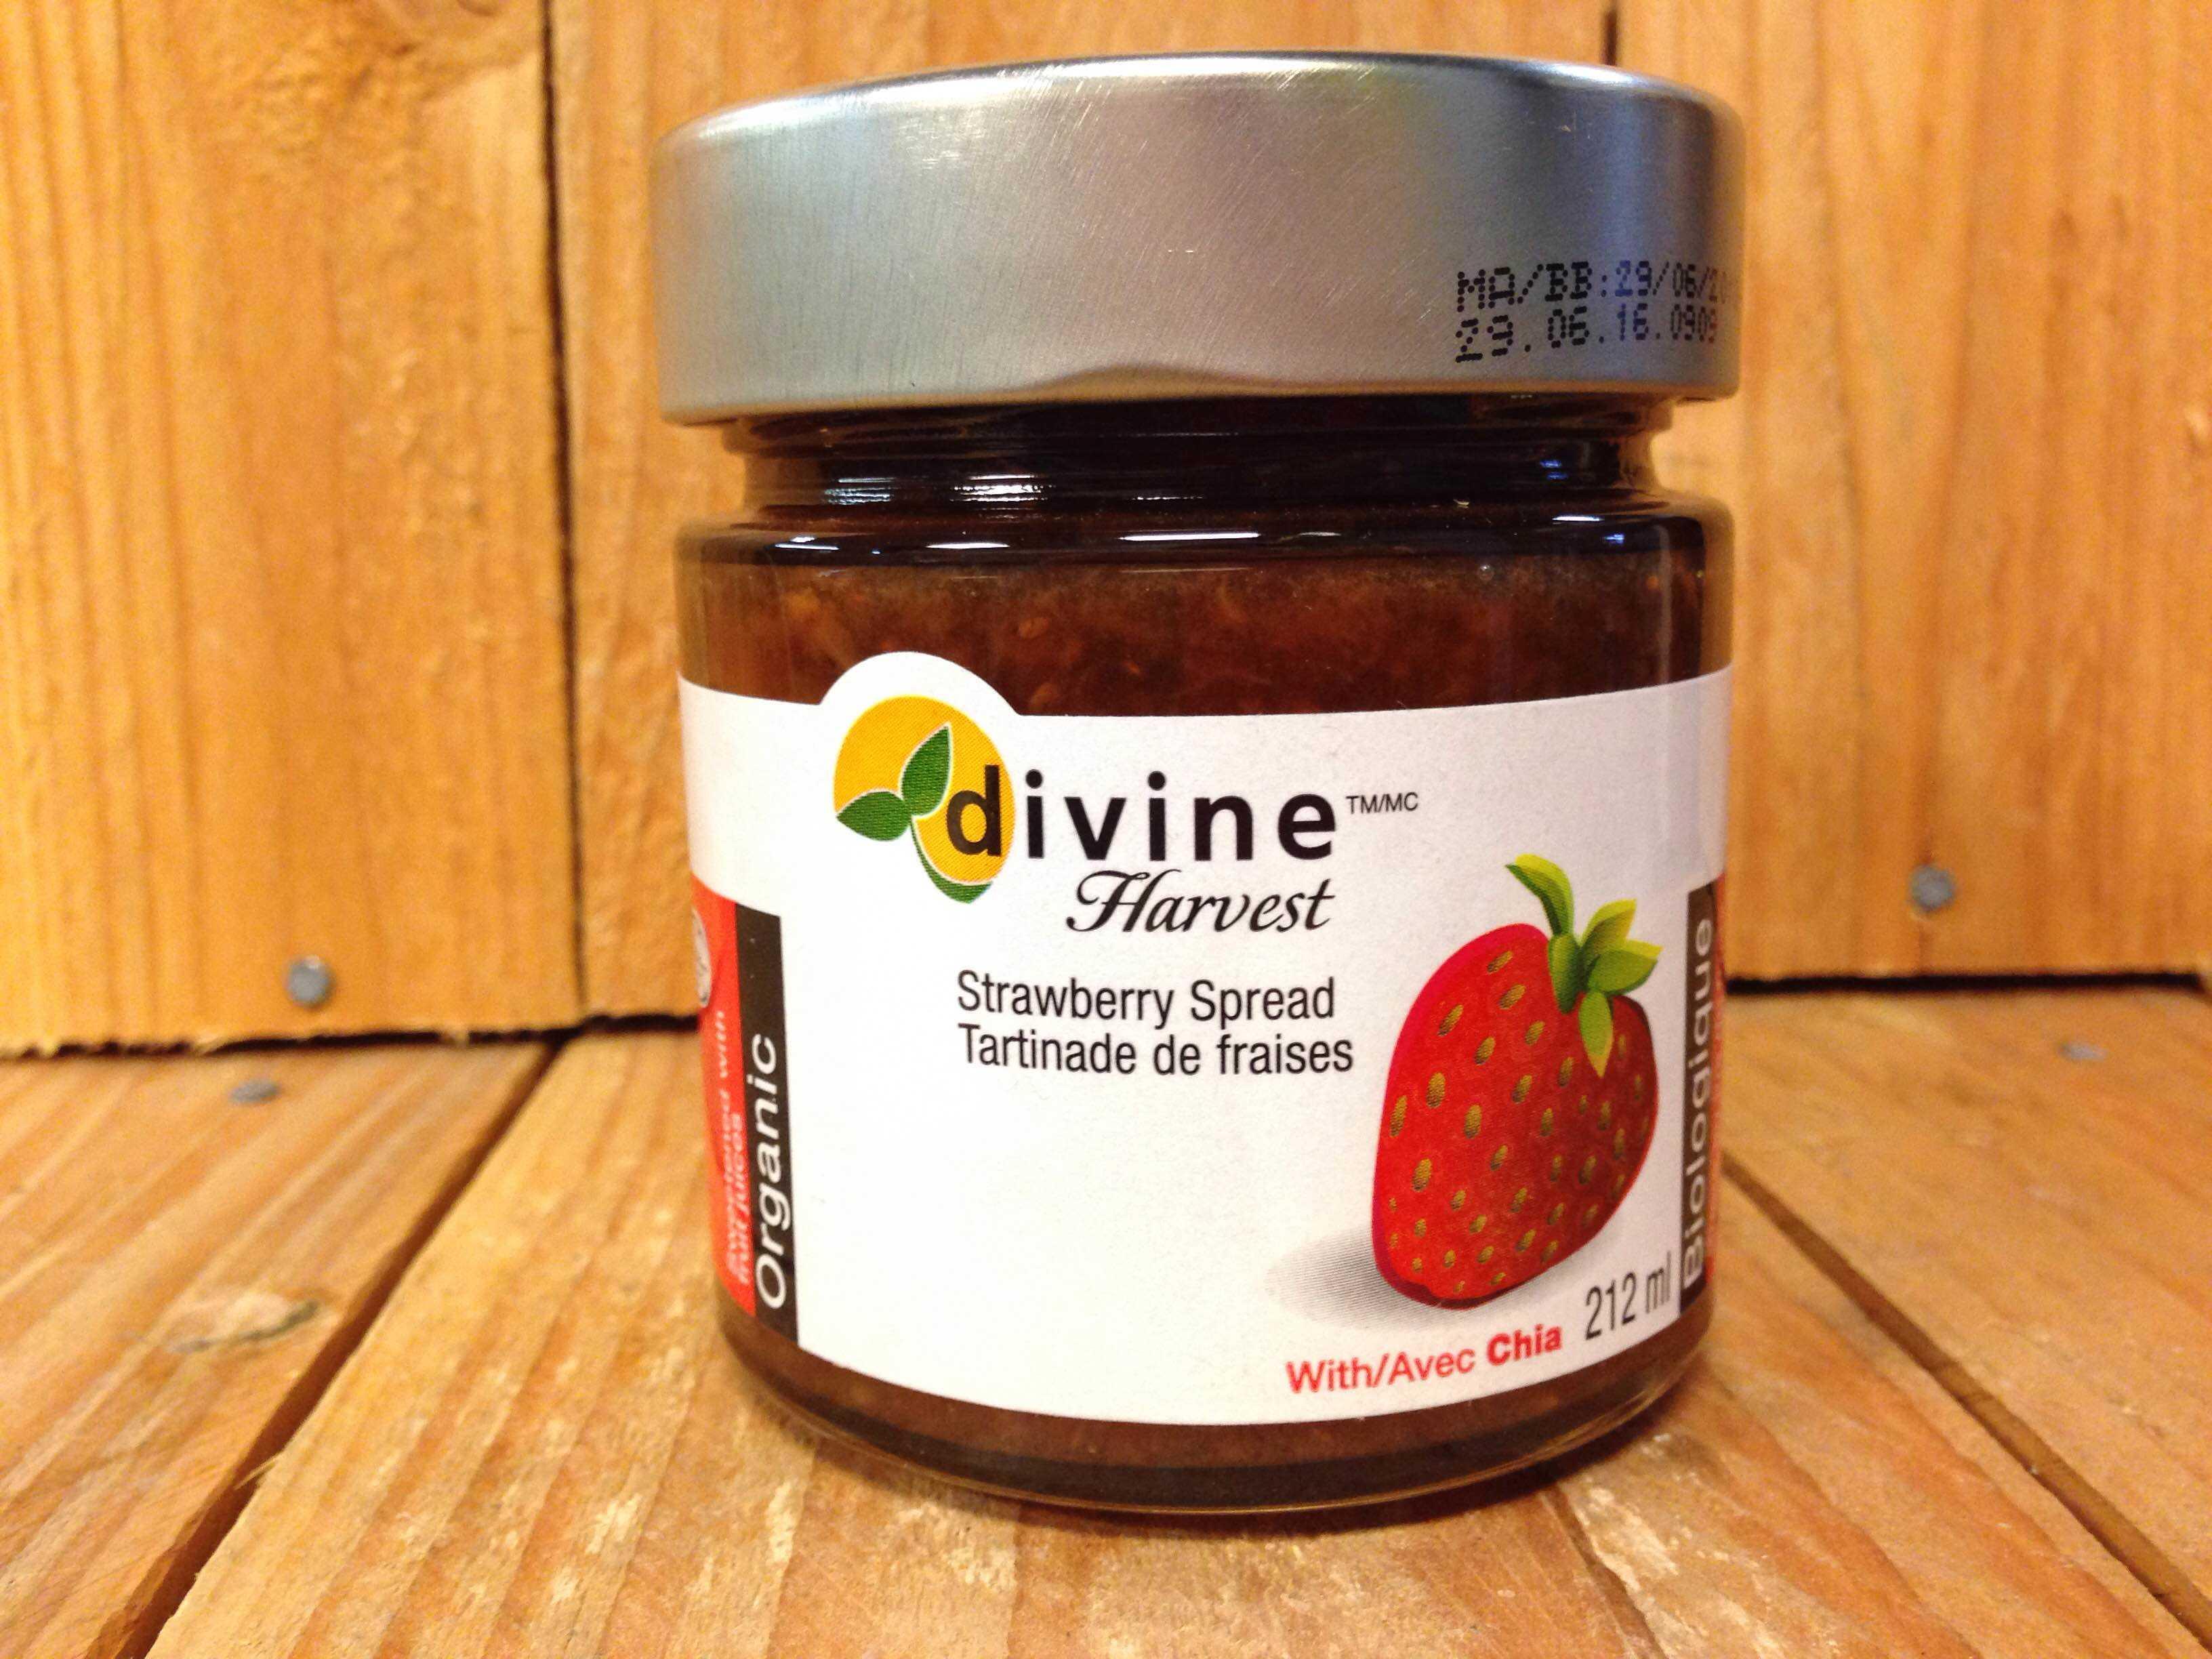 Divine Harvest – Organic Spread – Strawberry Chia (212ml Jar)